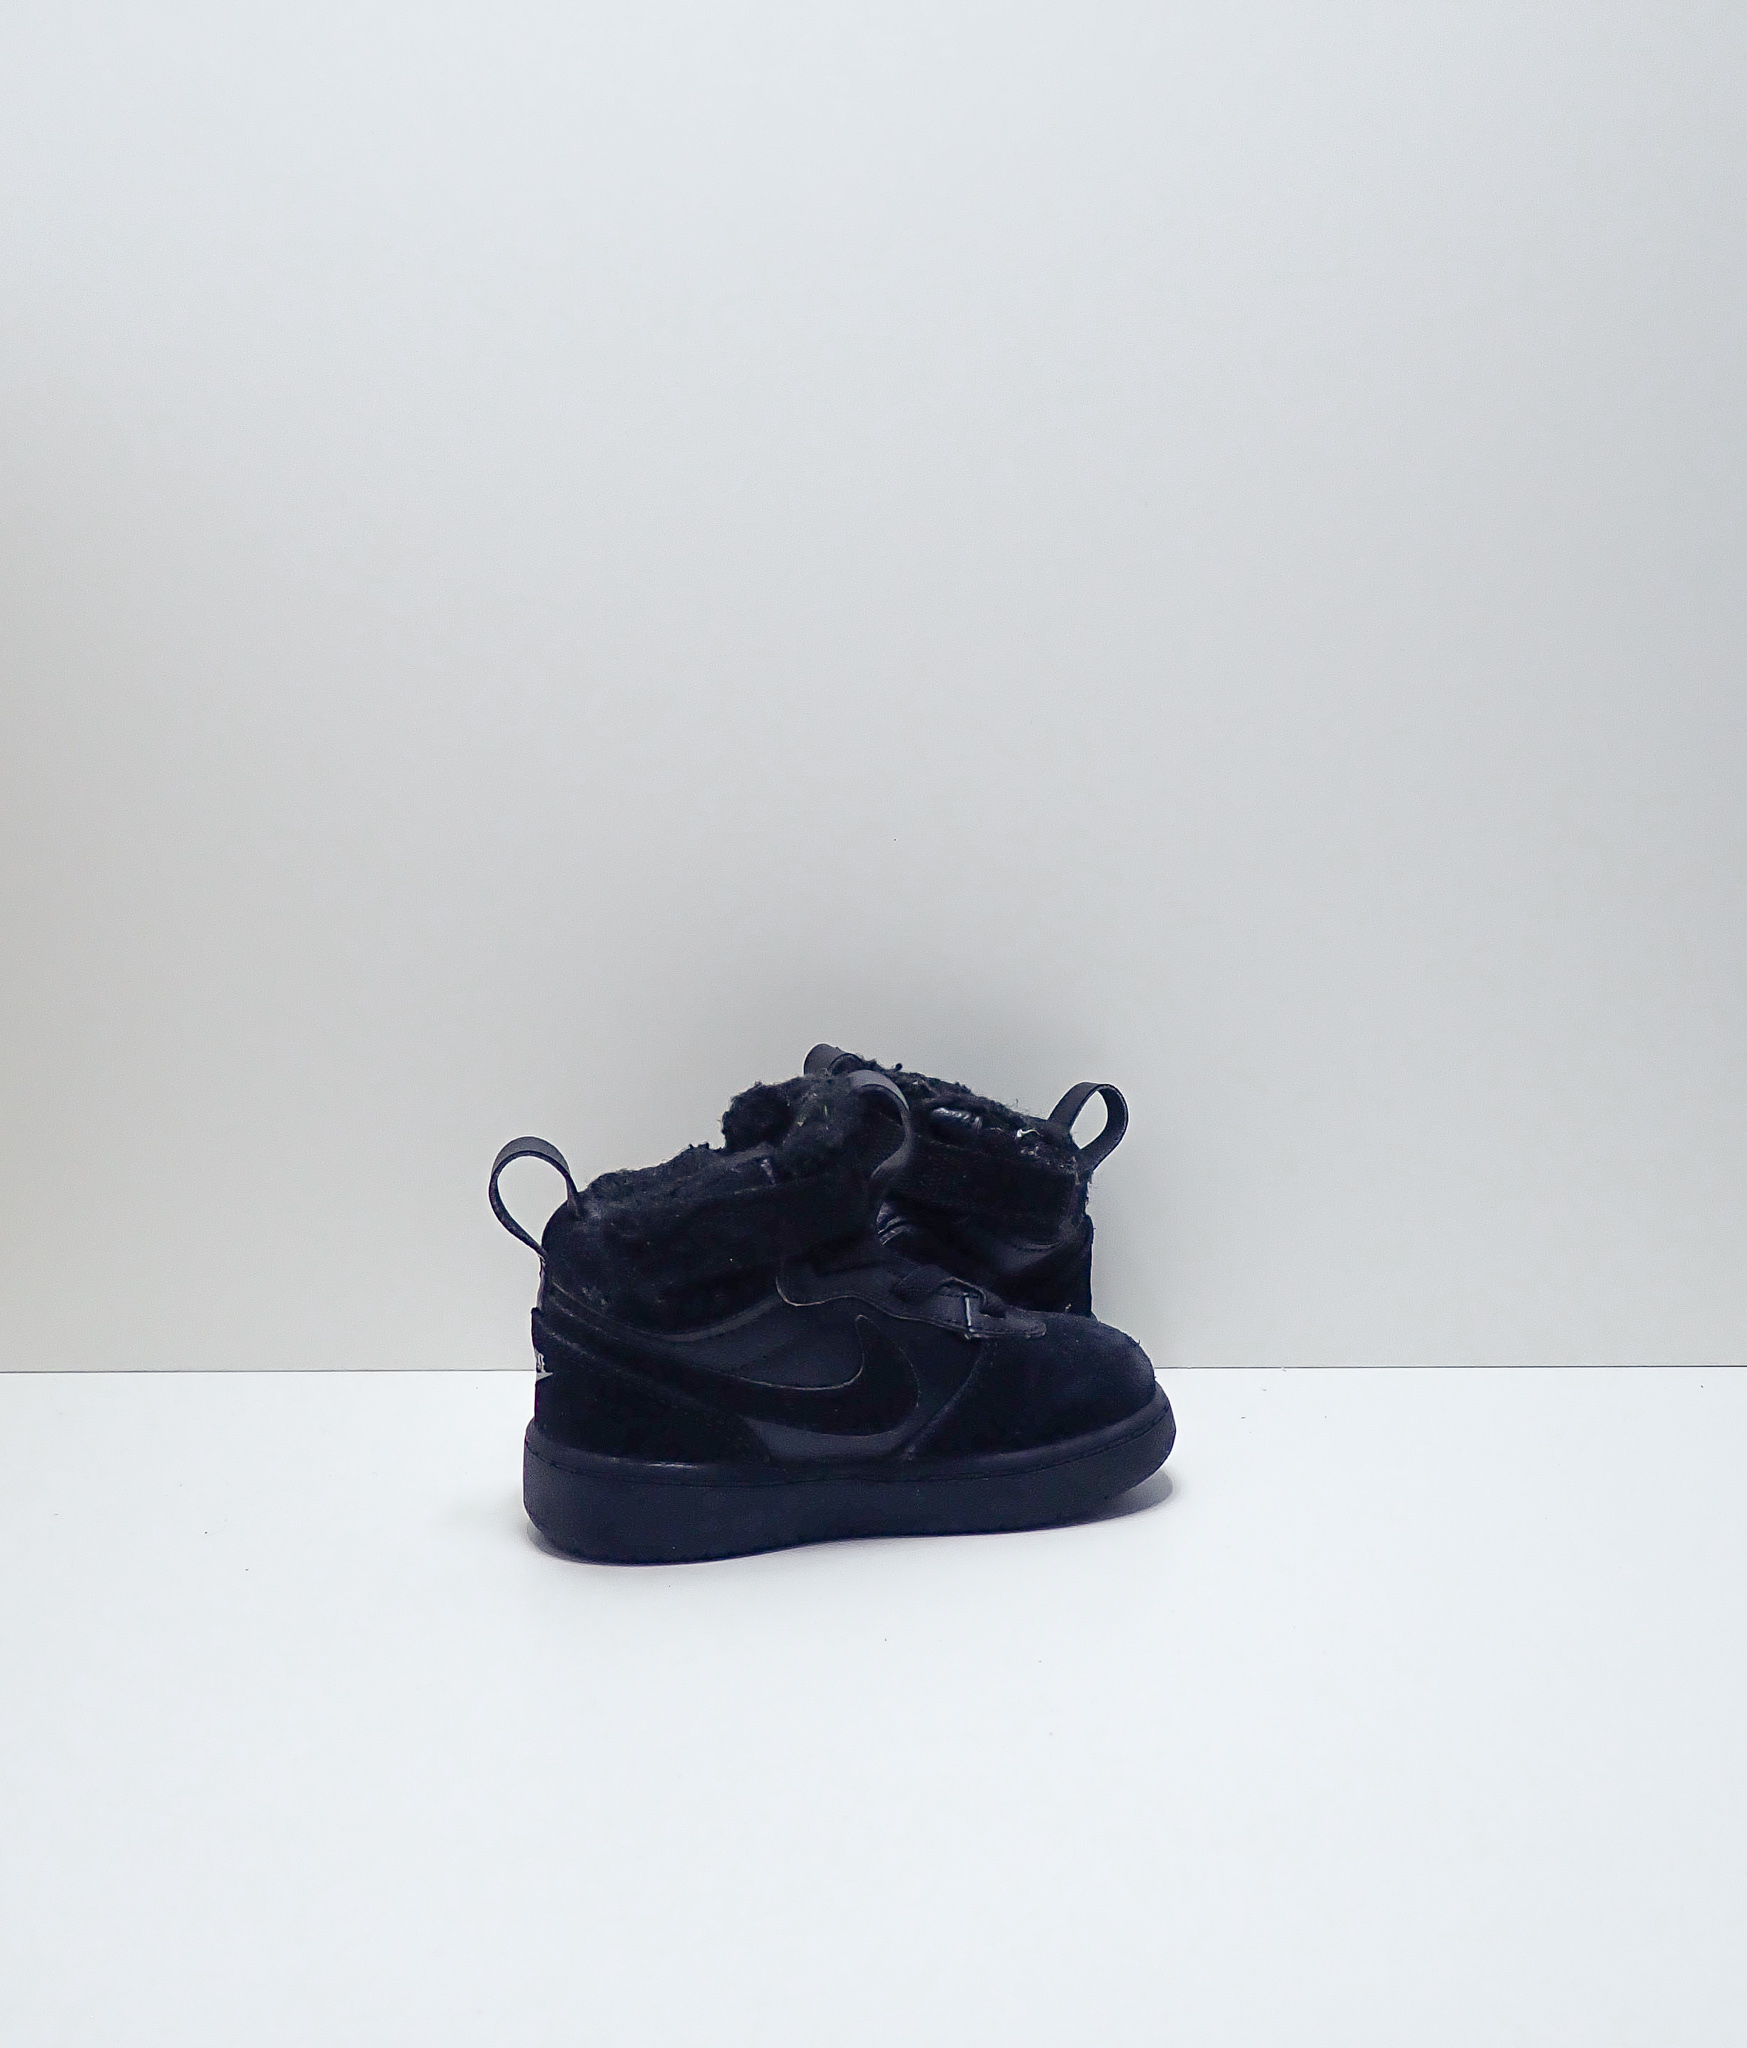 Nike Court Borough Mid 2 Boot Toddler